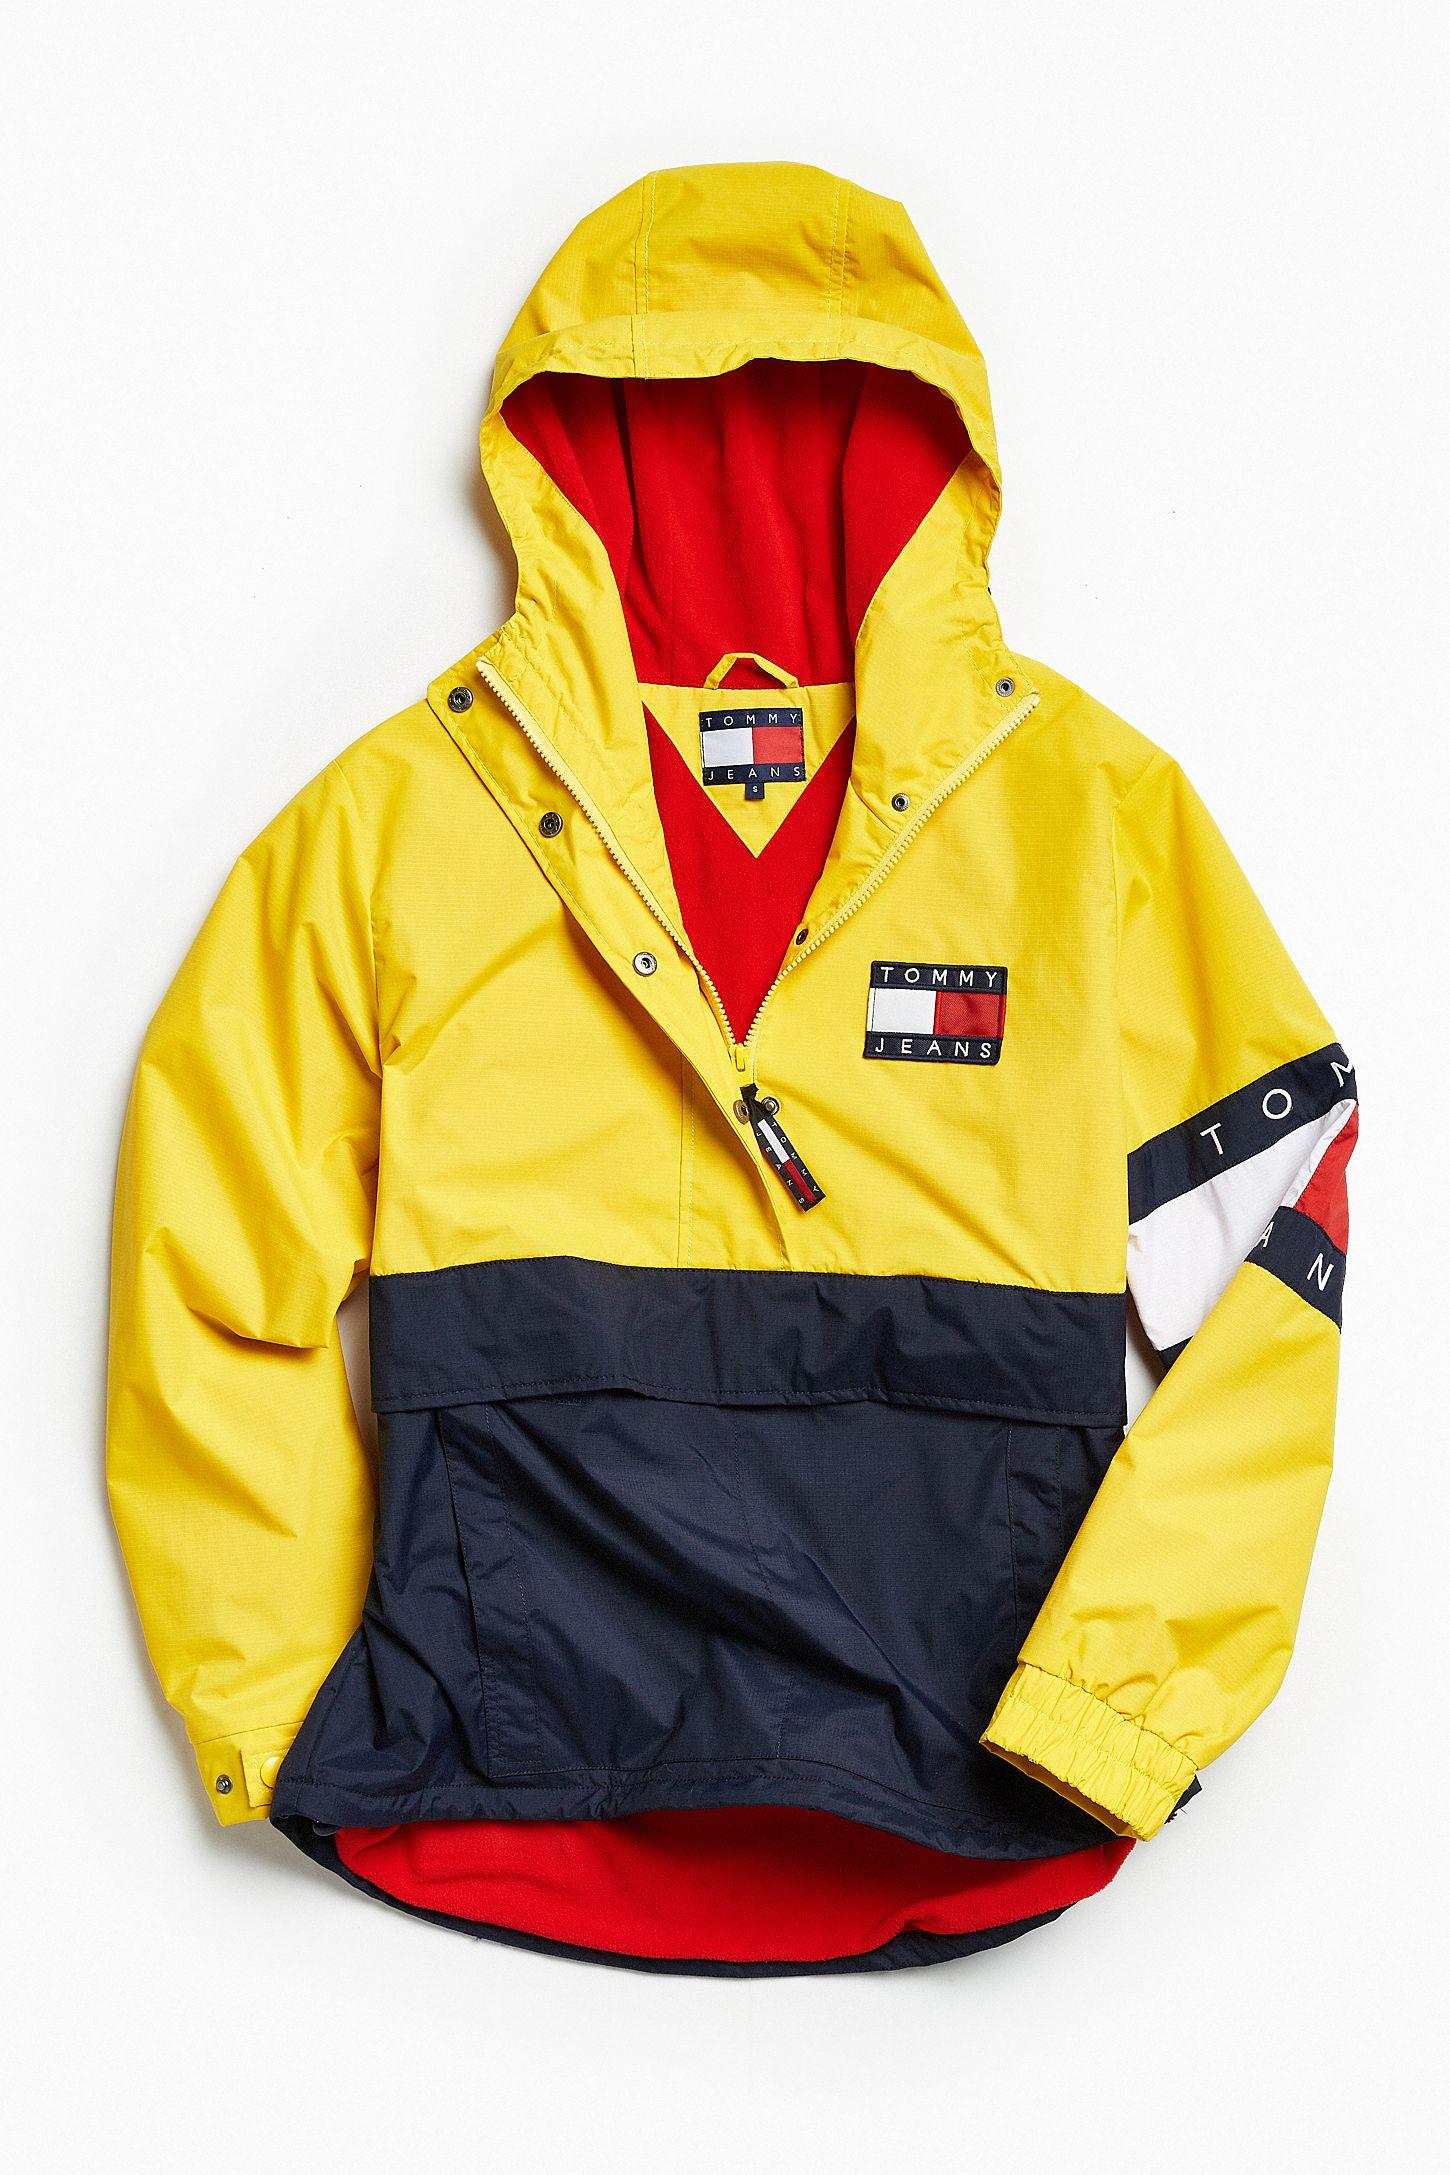 9e3fa796c Tommy Hilfiger Colorblocked Pullover Windbreaker Jacket